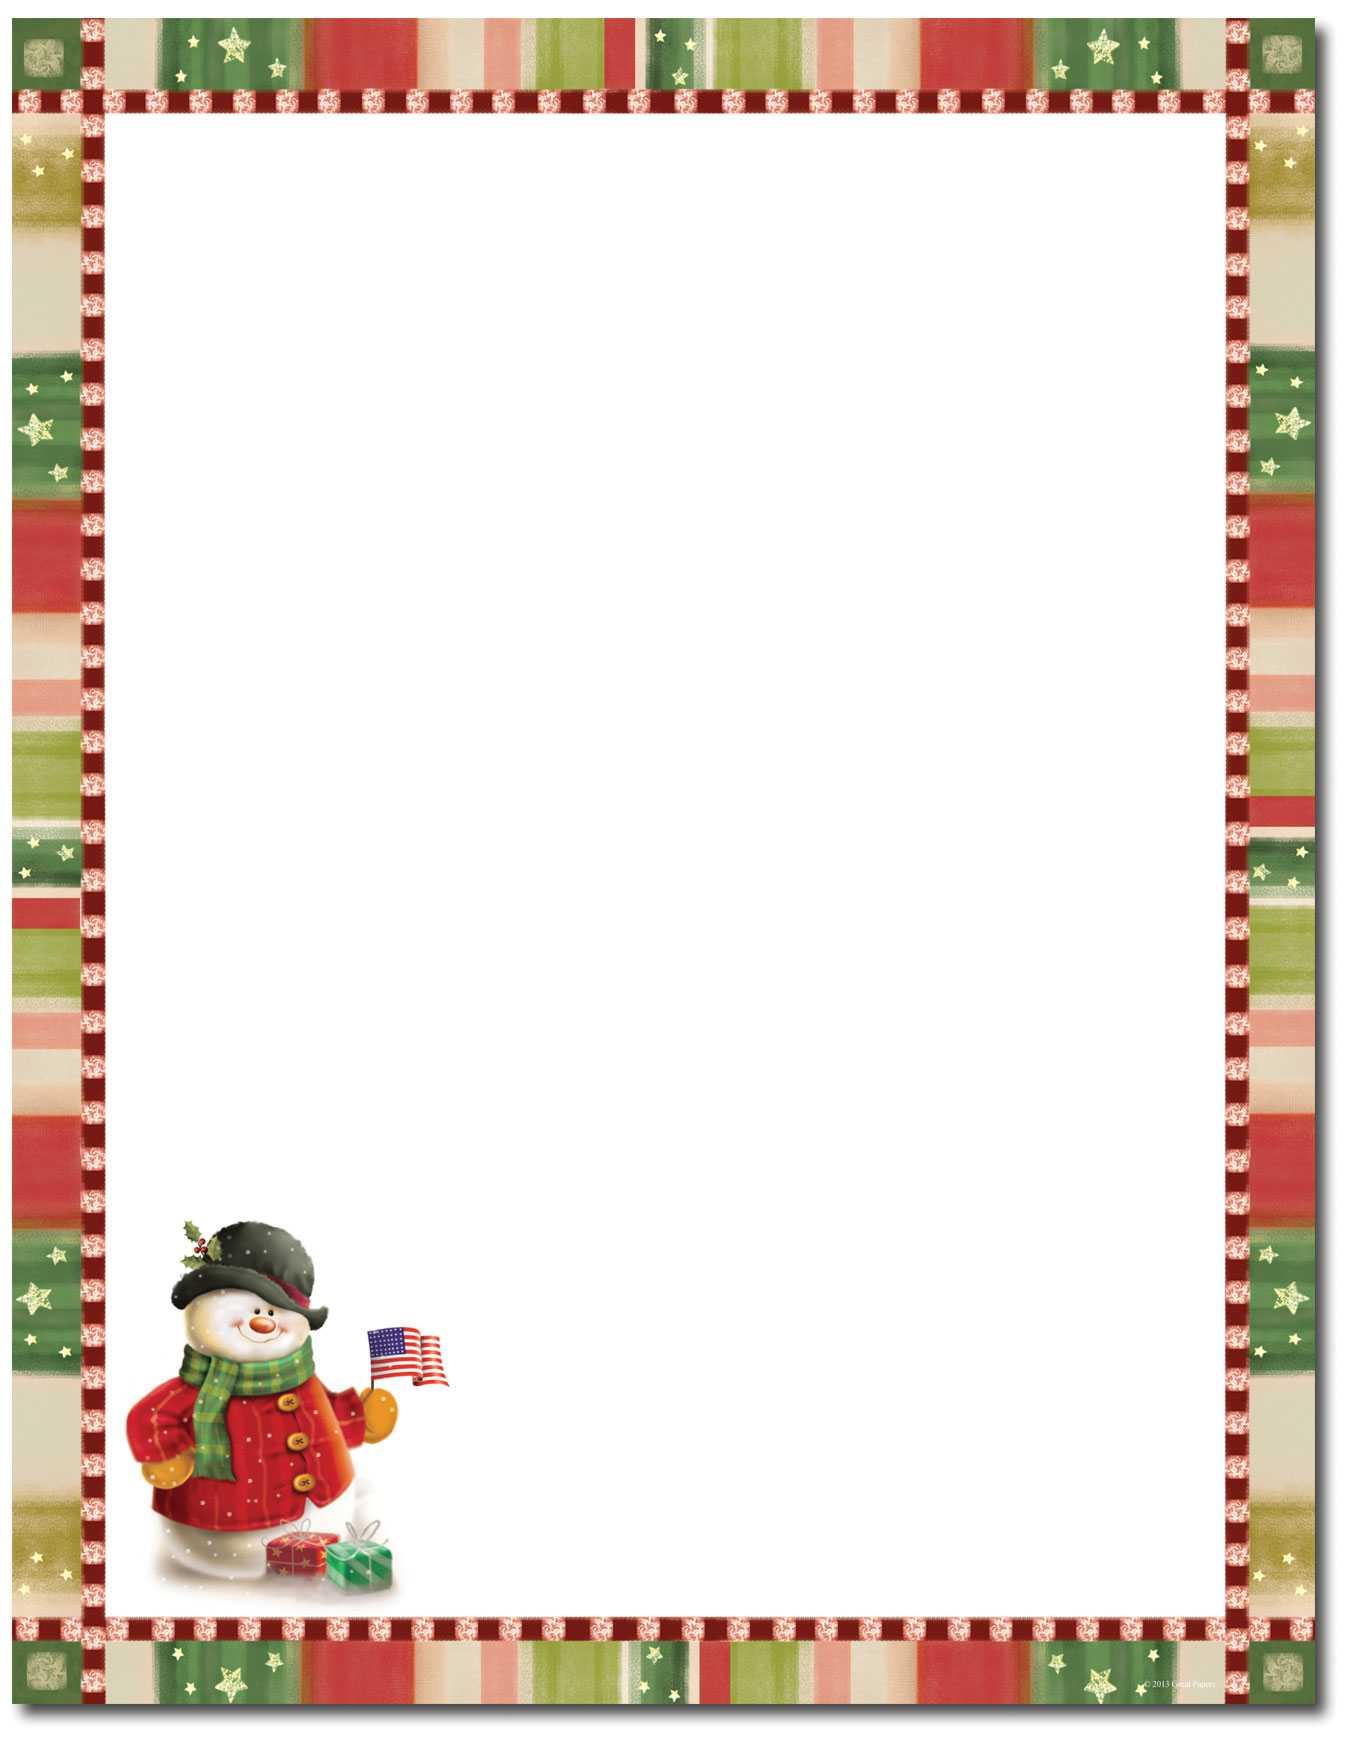 Letterhead Templates Christmas | Create Your Perfect Résumé With Regard To Christmas Letterhead Template